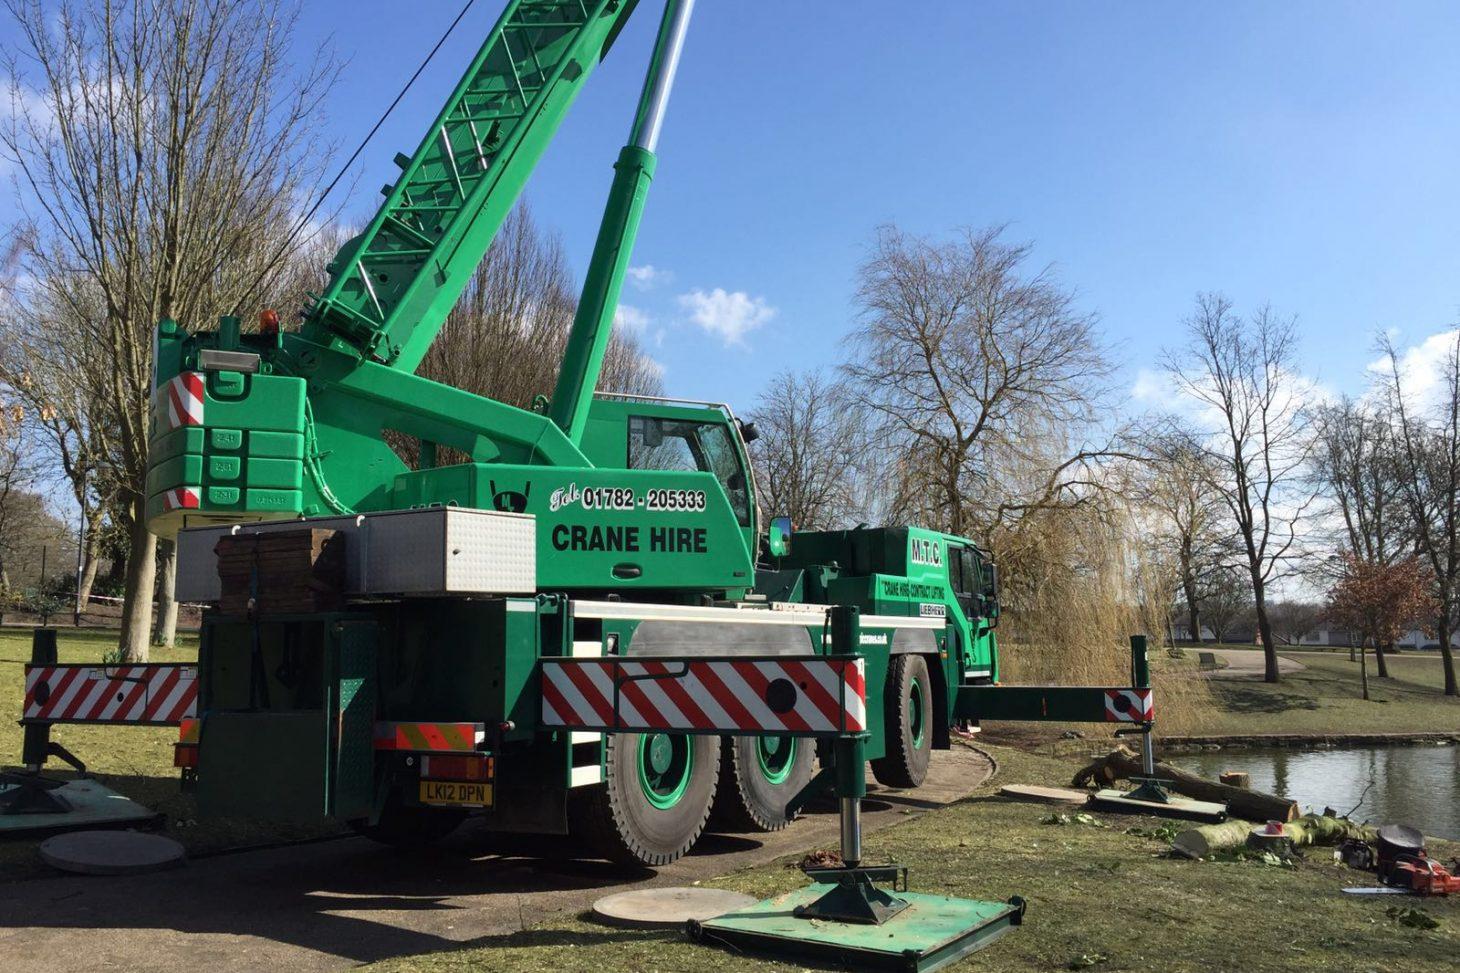 Liebherr Telescopic Crane Hire / Mobile Crane Hire